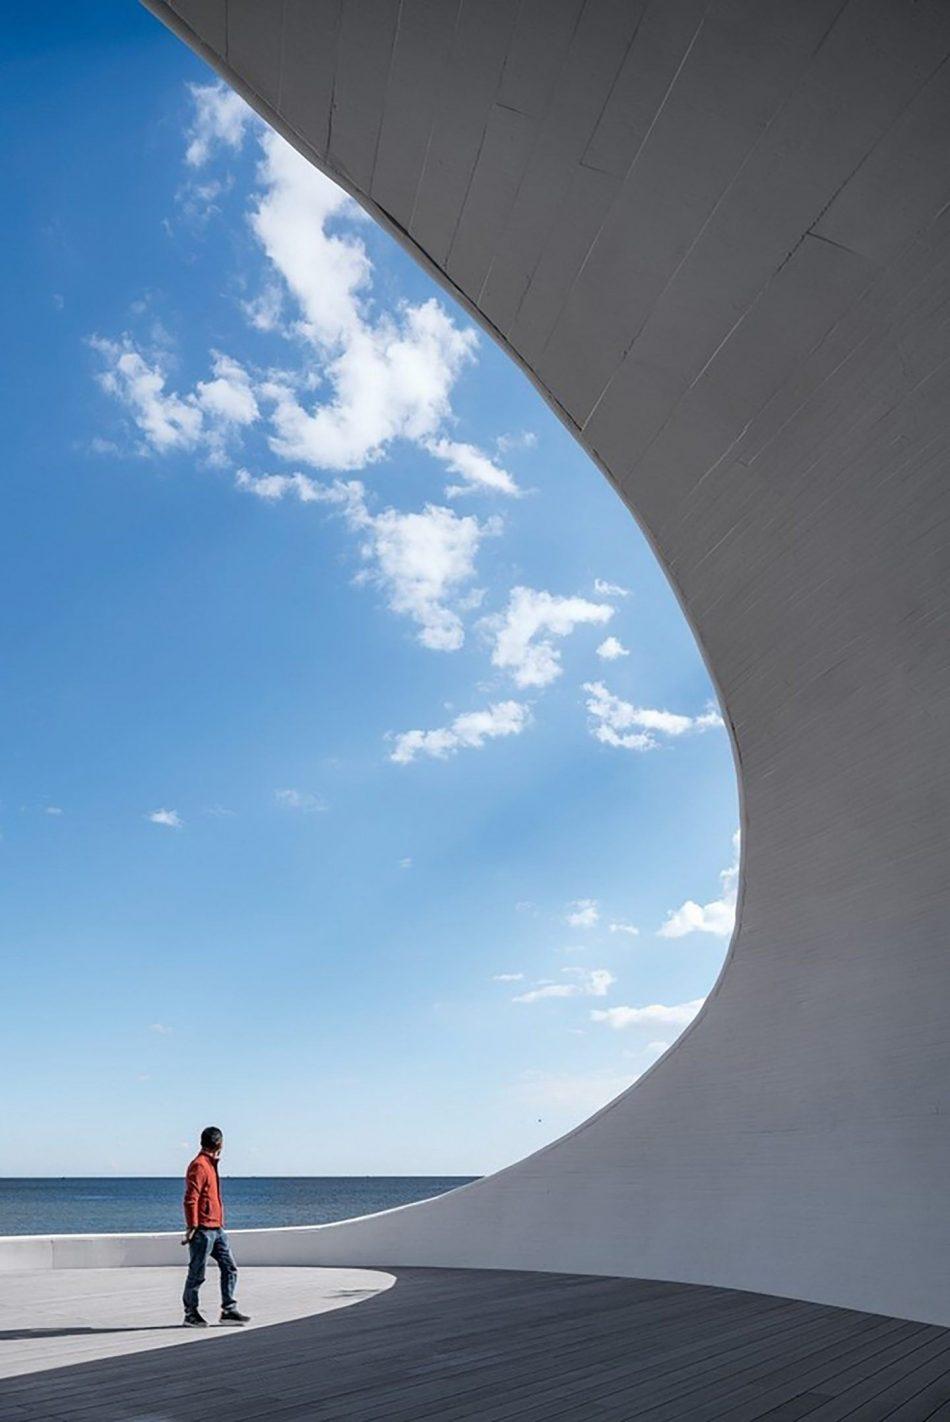 Stunning Subterranean Museum Built Beneath The Sand Dunes In China stunning subterranean museum built beneath sand dunes china 11